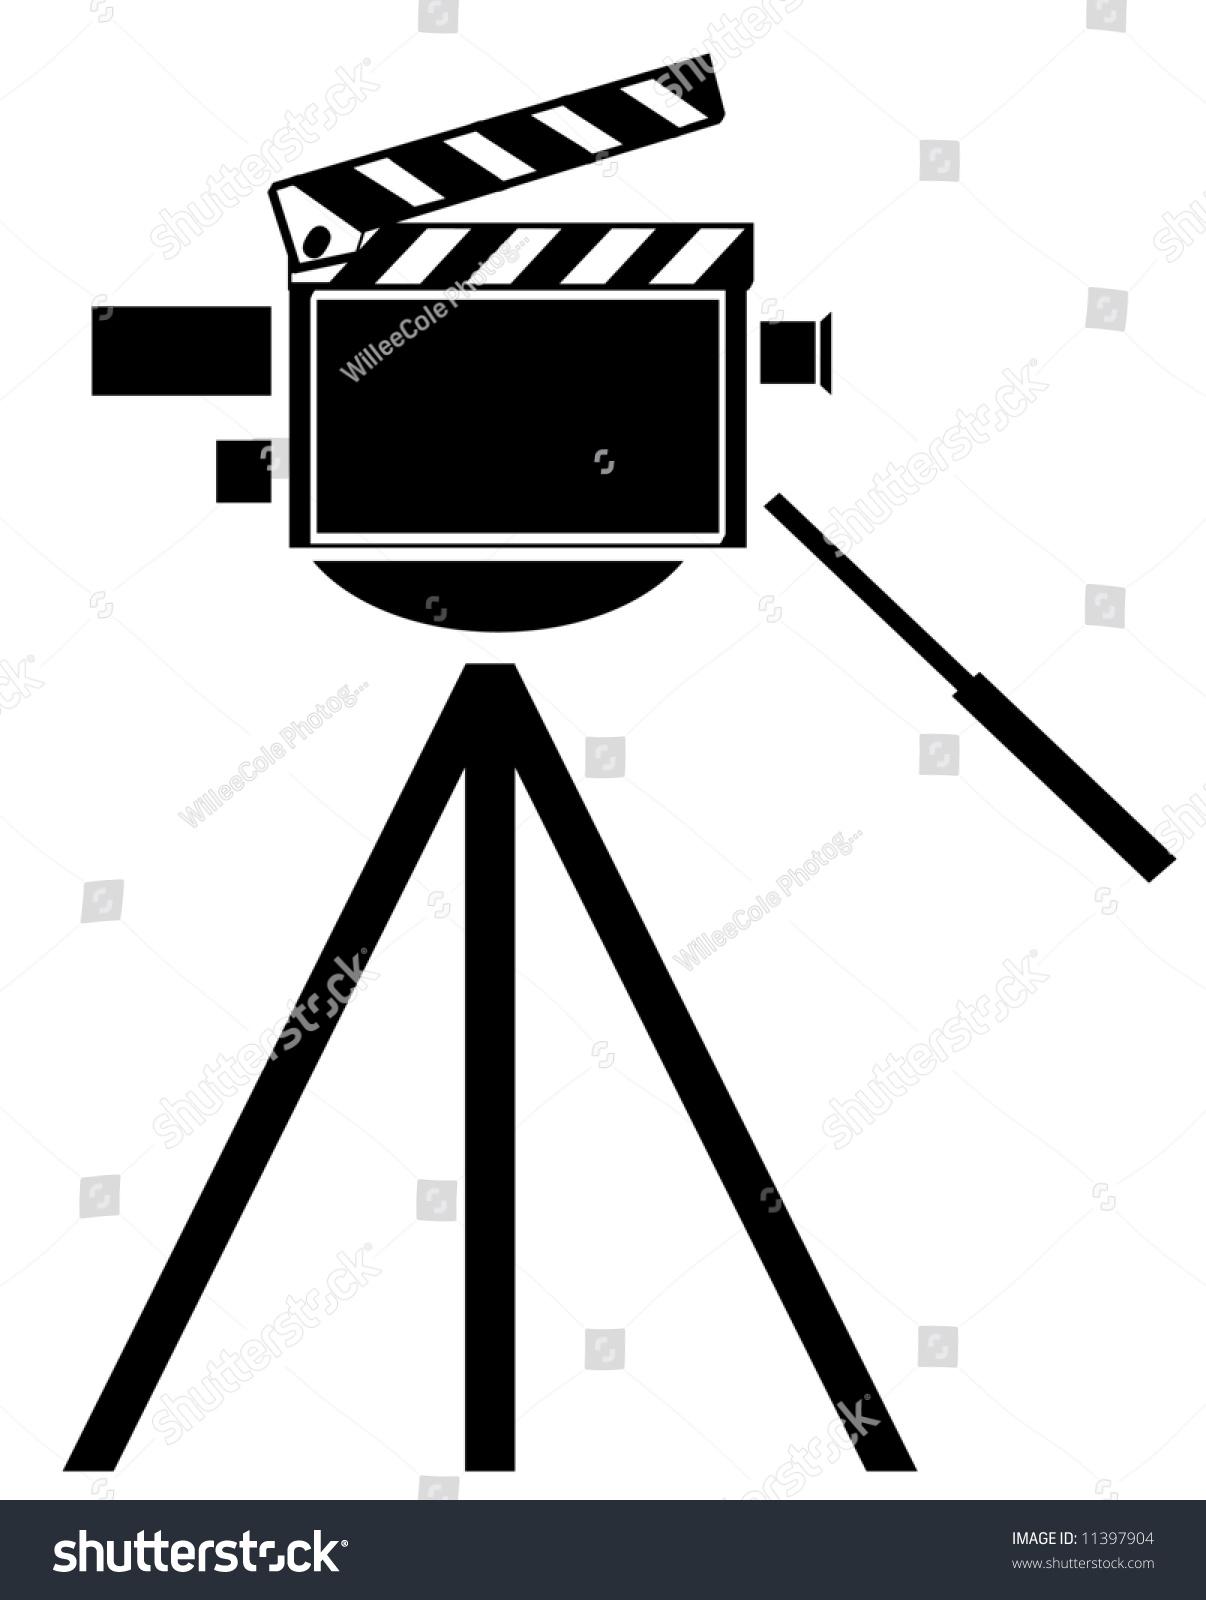 ppt素材摄影图标